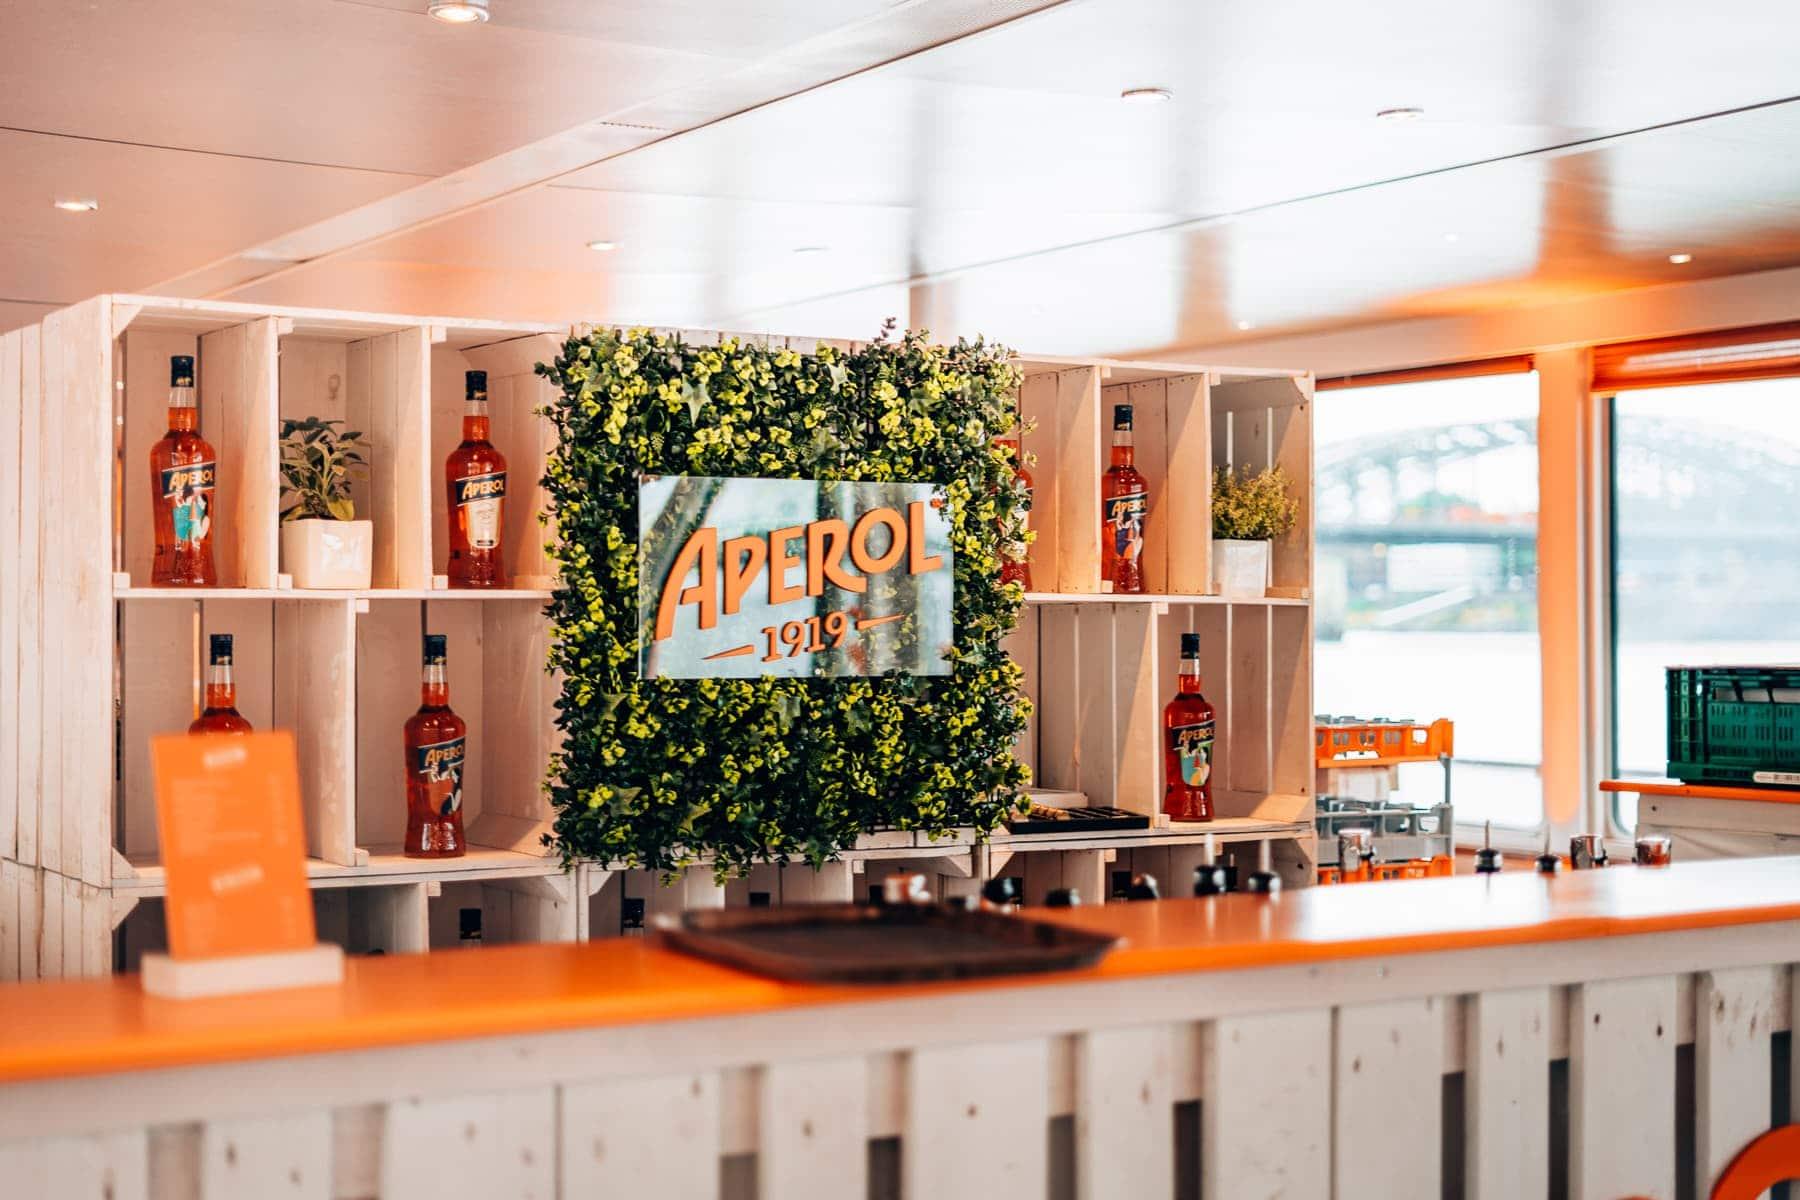 Aperol meets Kölle - Sundowner Bootsfahrt zum 100. jährigen Jubiläum